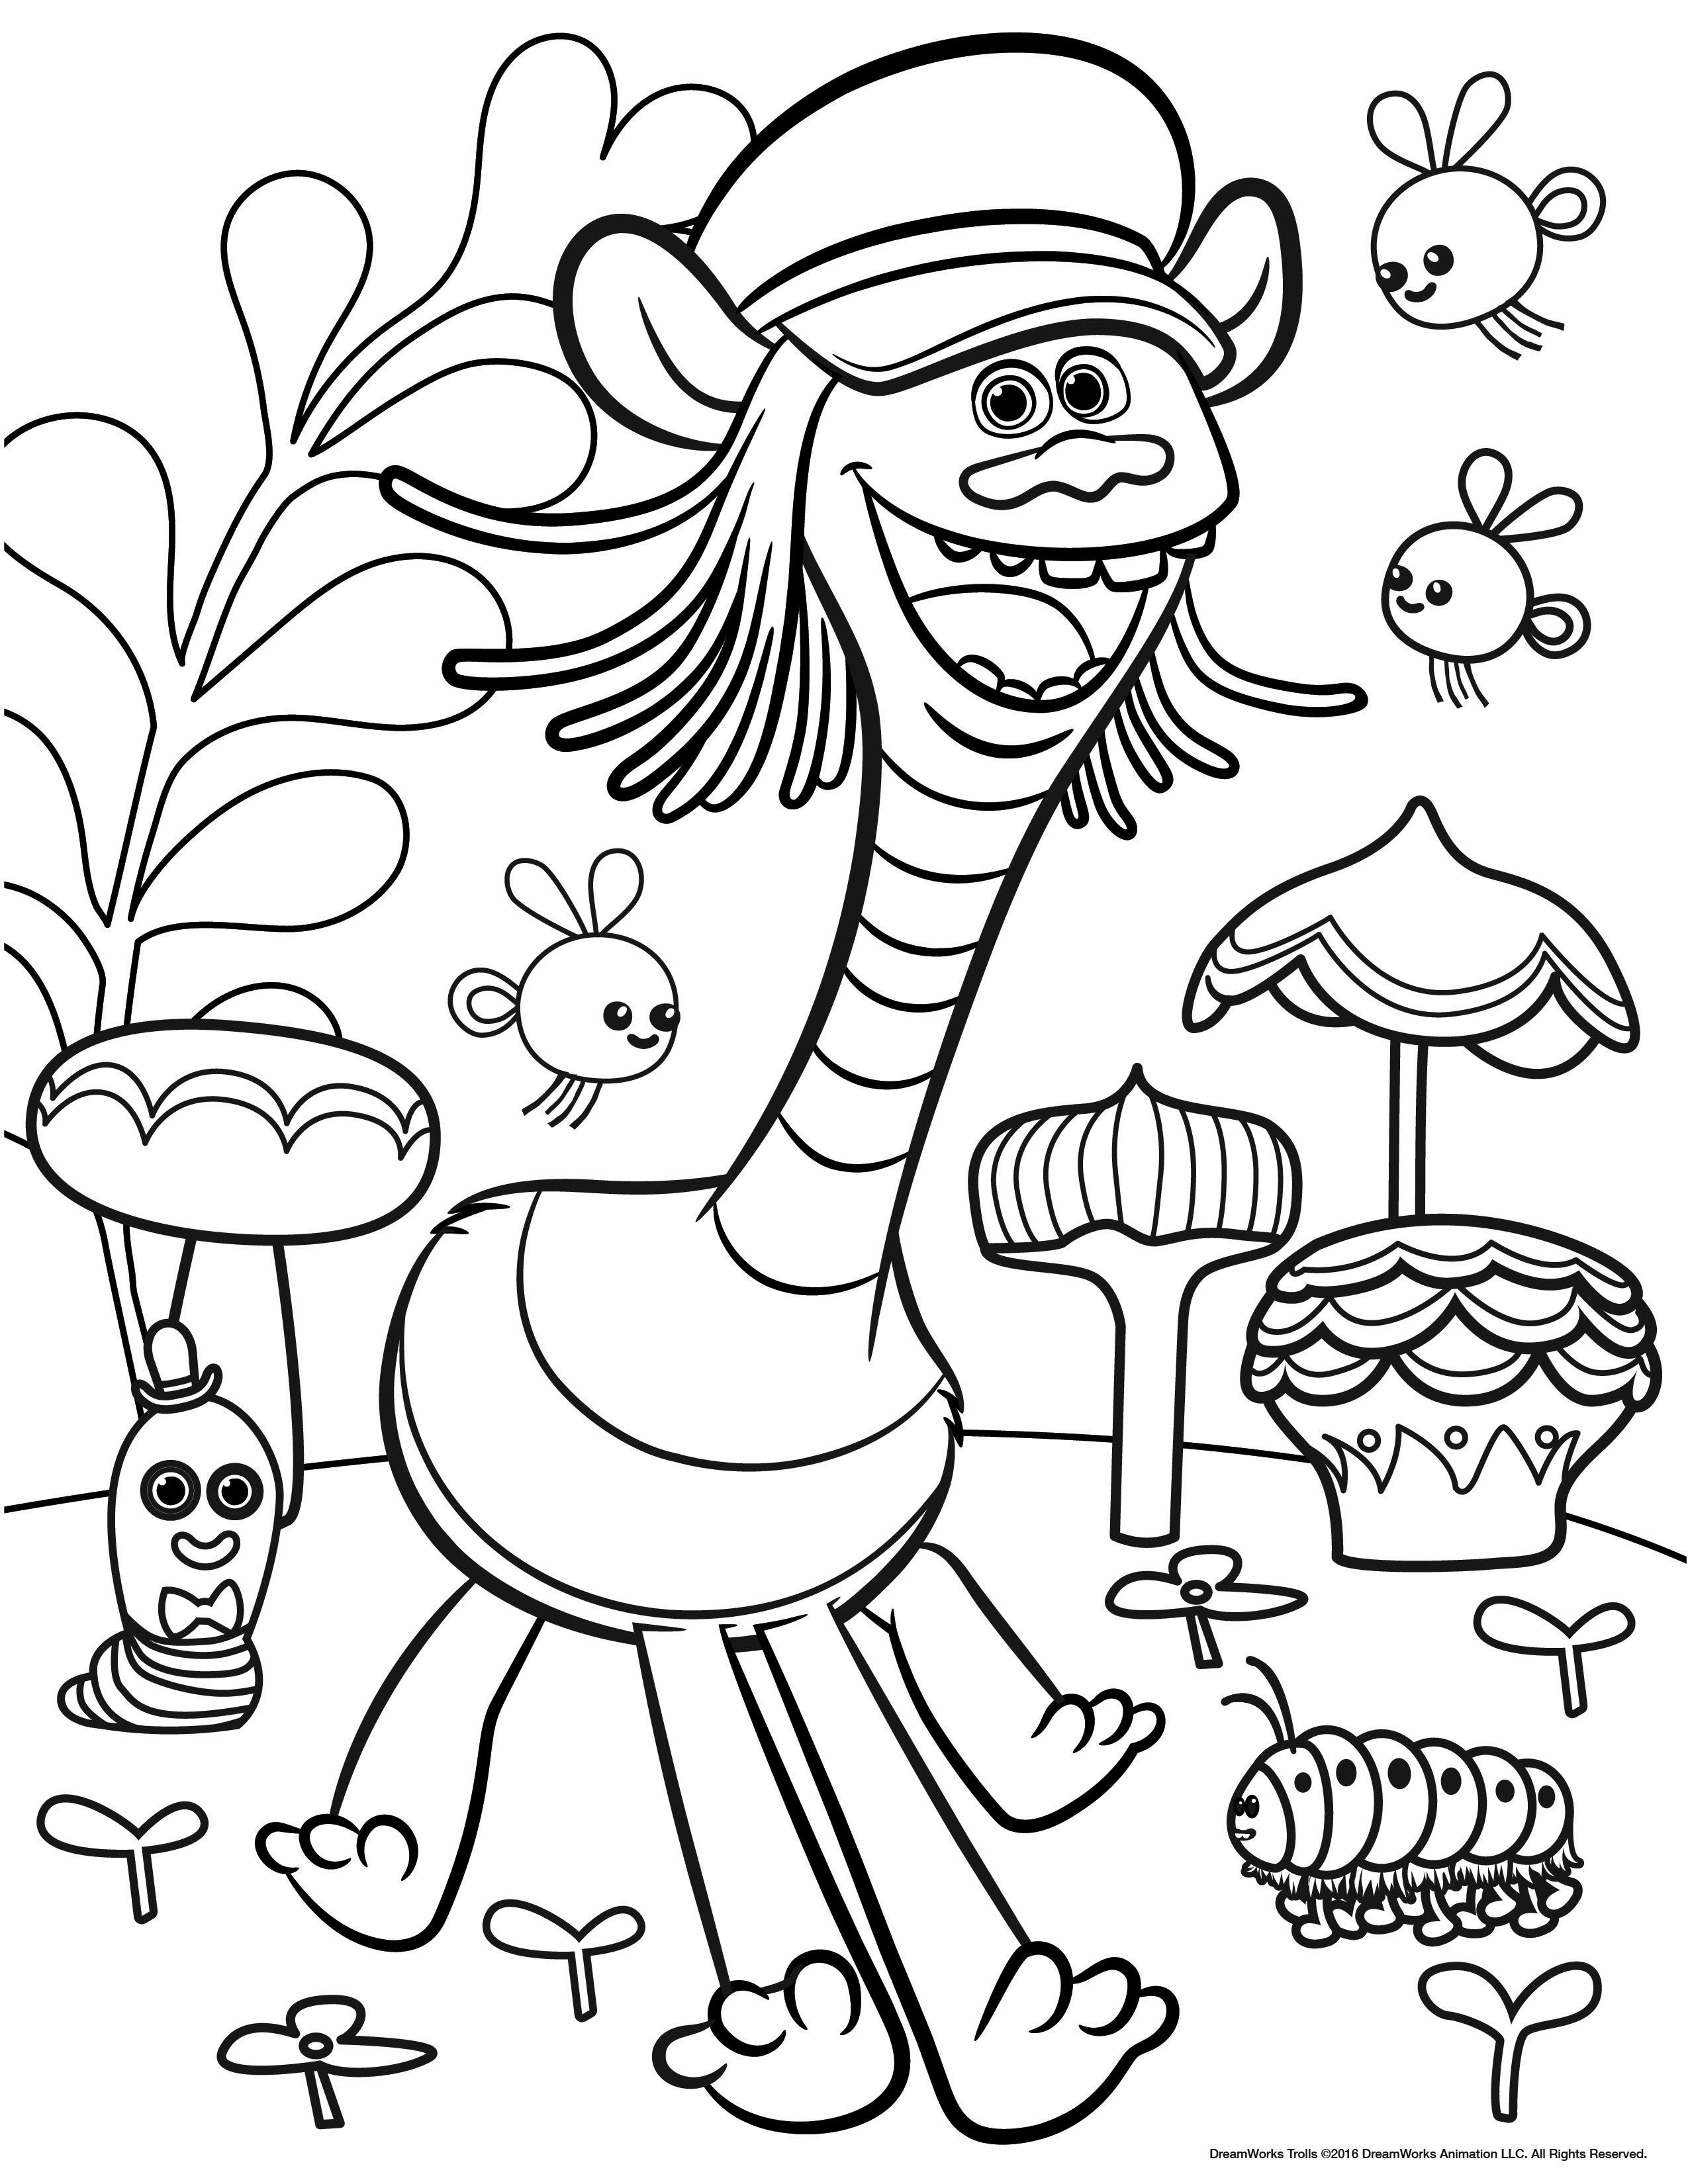 Bilderesultat for coloring trolls | Car activity | Pinterest